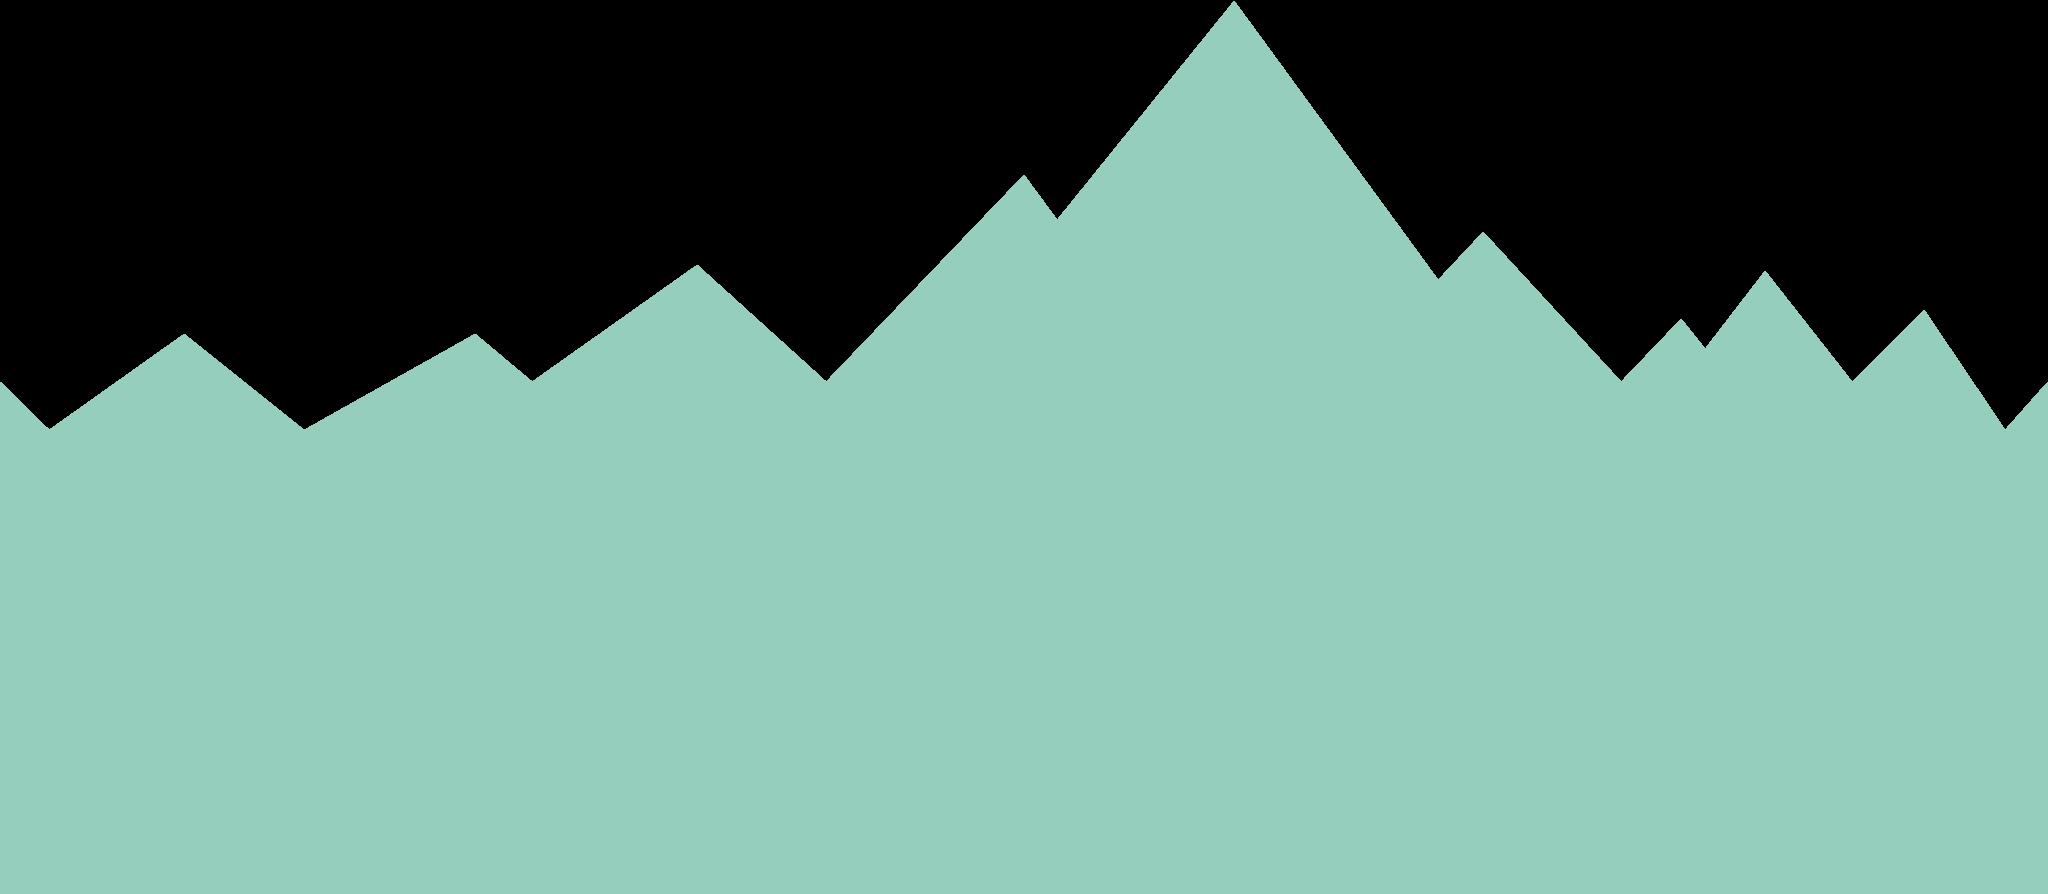 Mountain Sprite Background